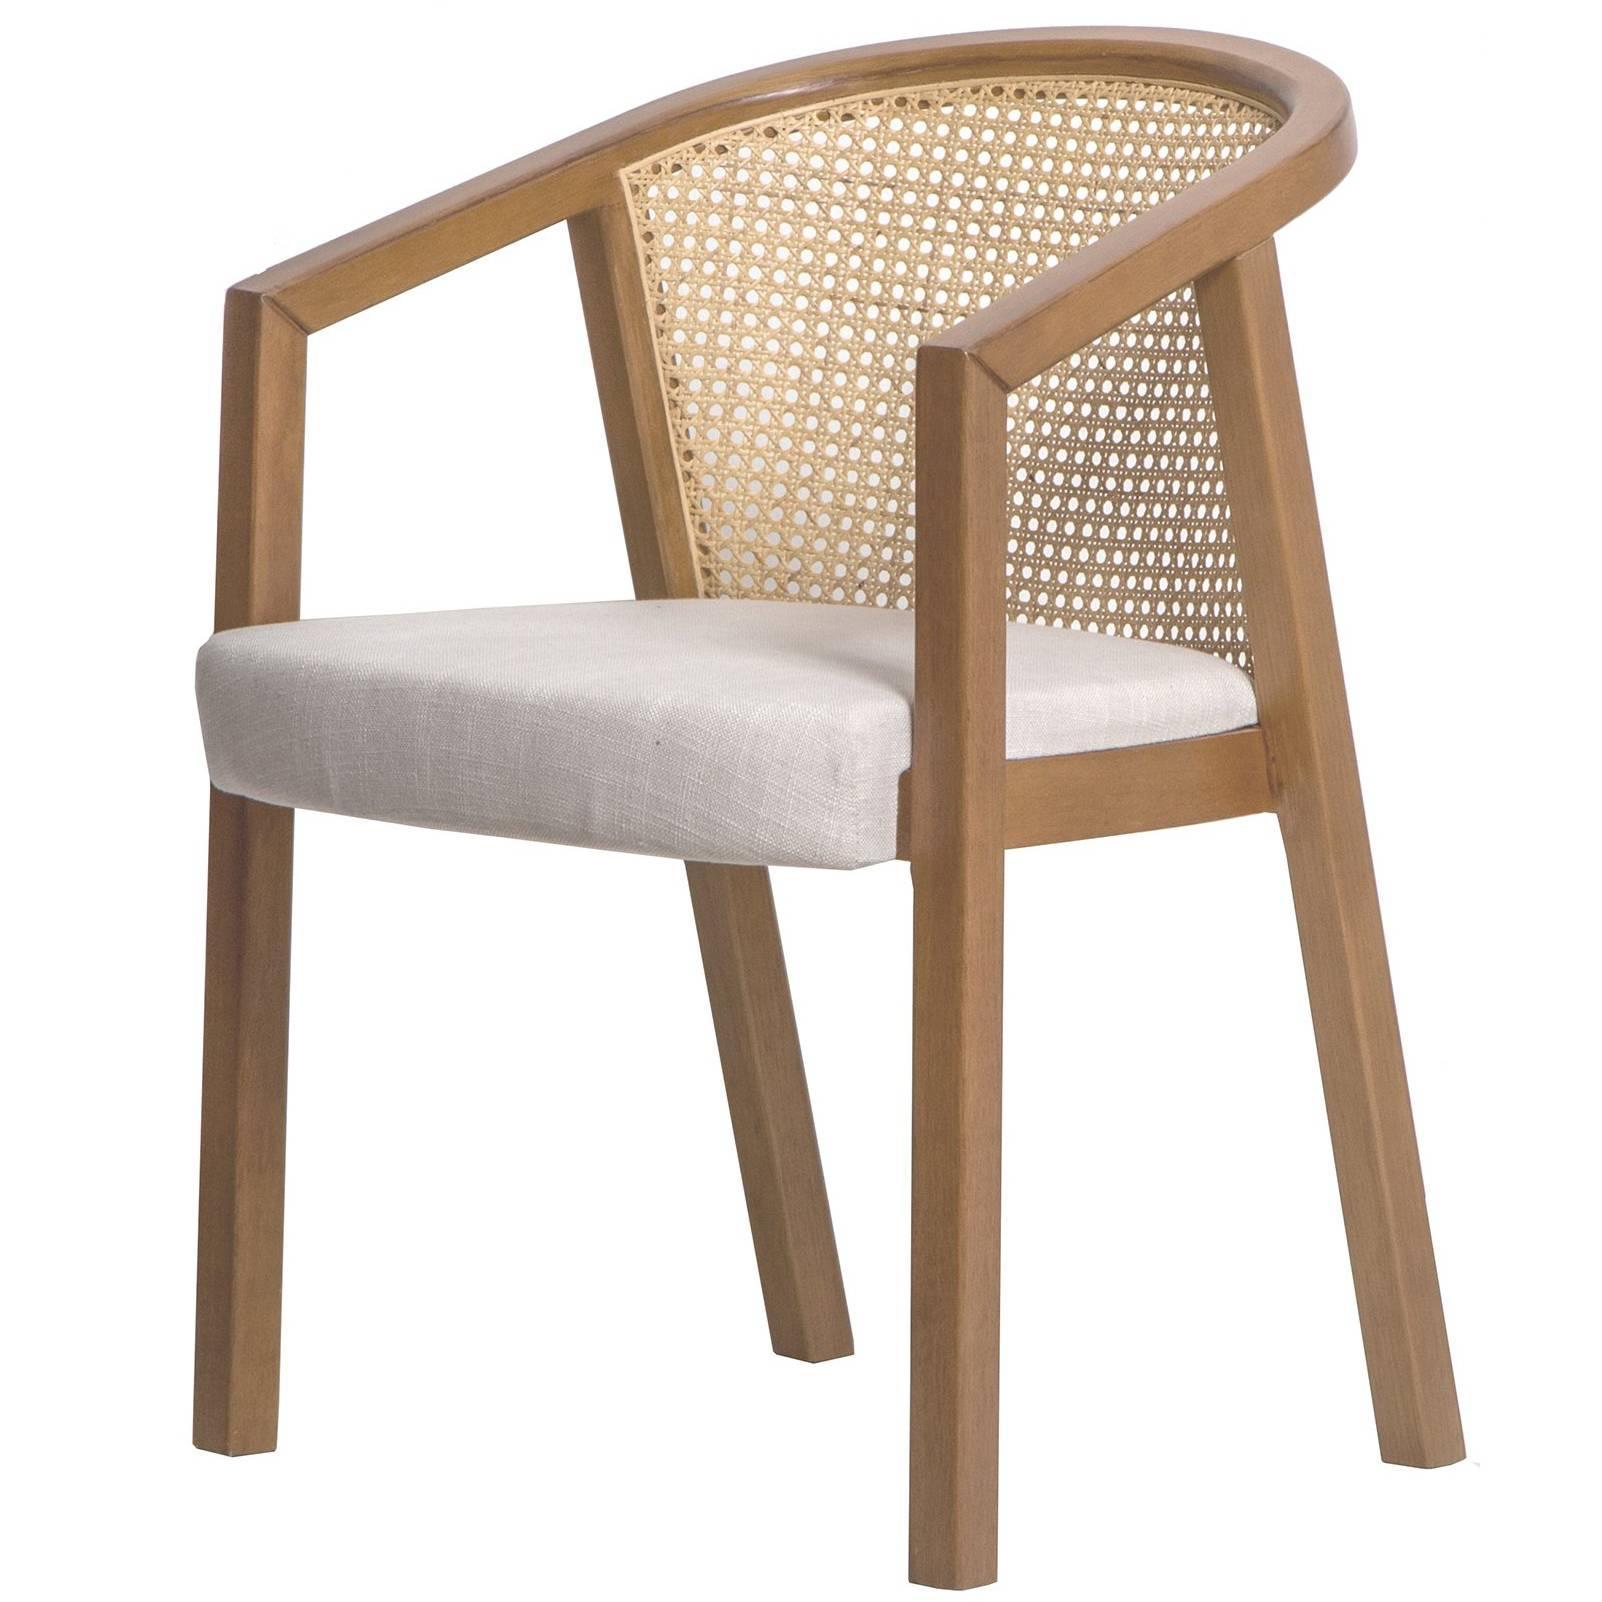 Gradeada Brazilian Contemporary Wood and Straw Chair by Lattoog